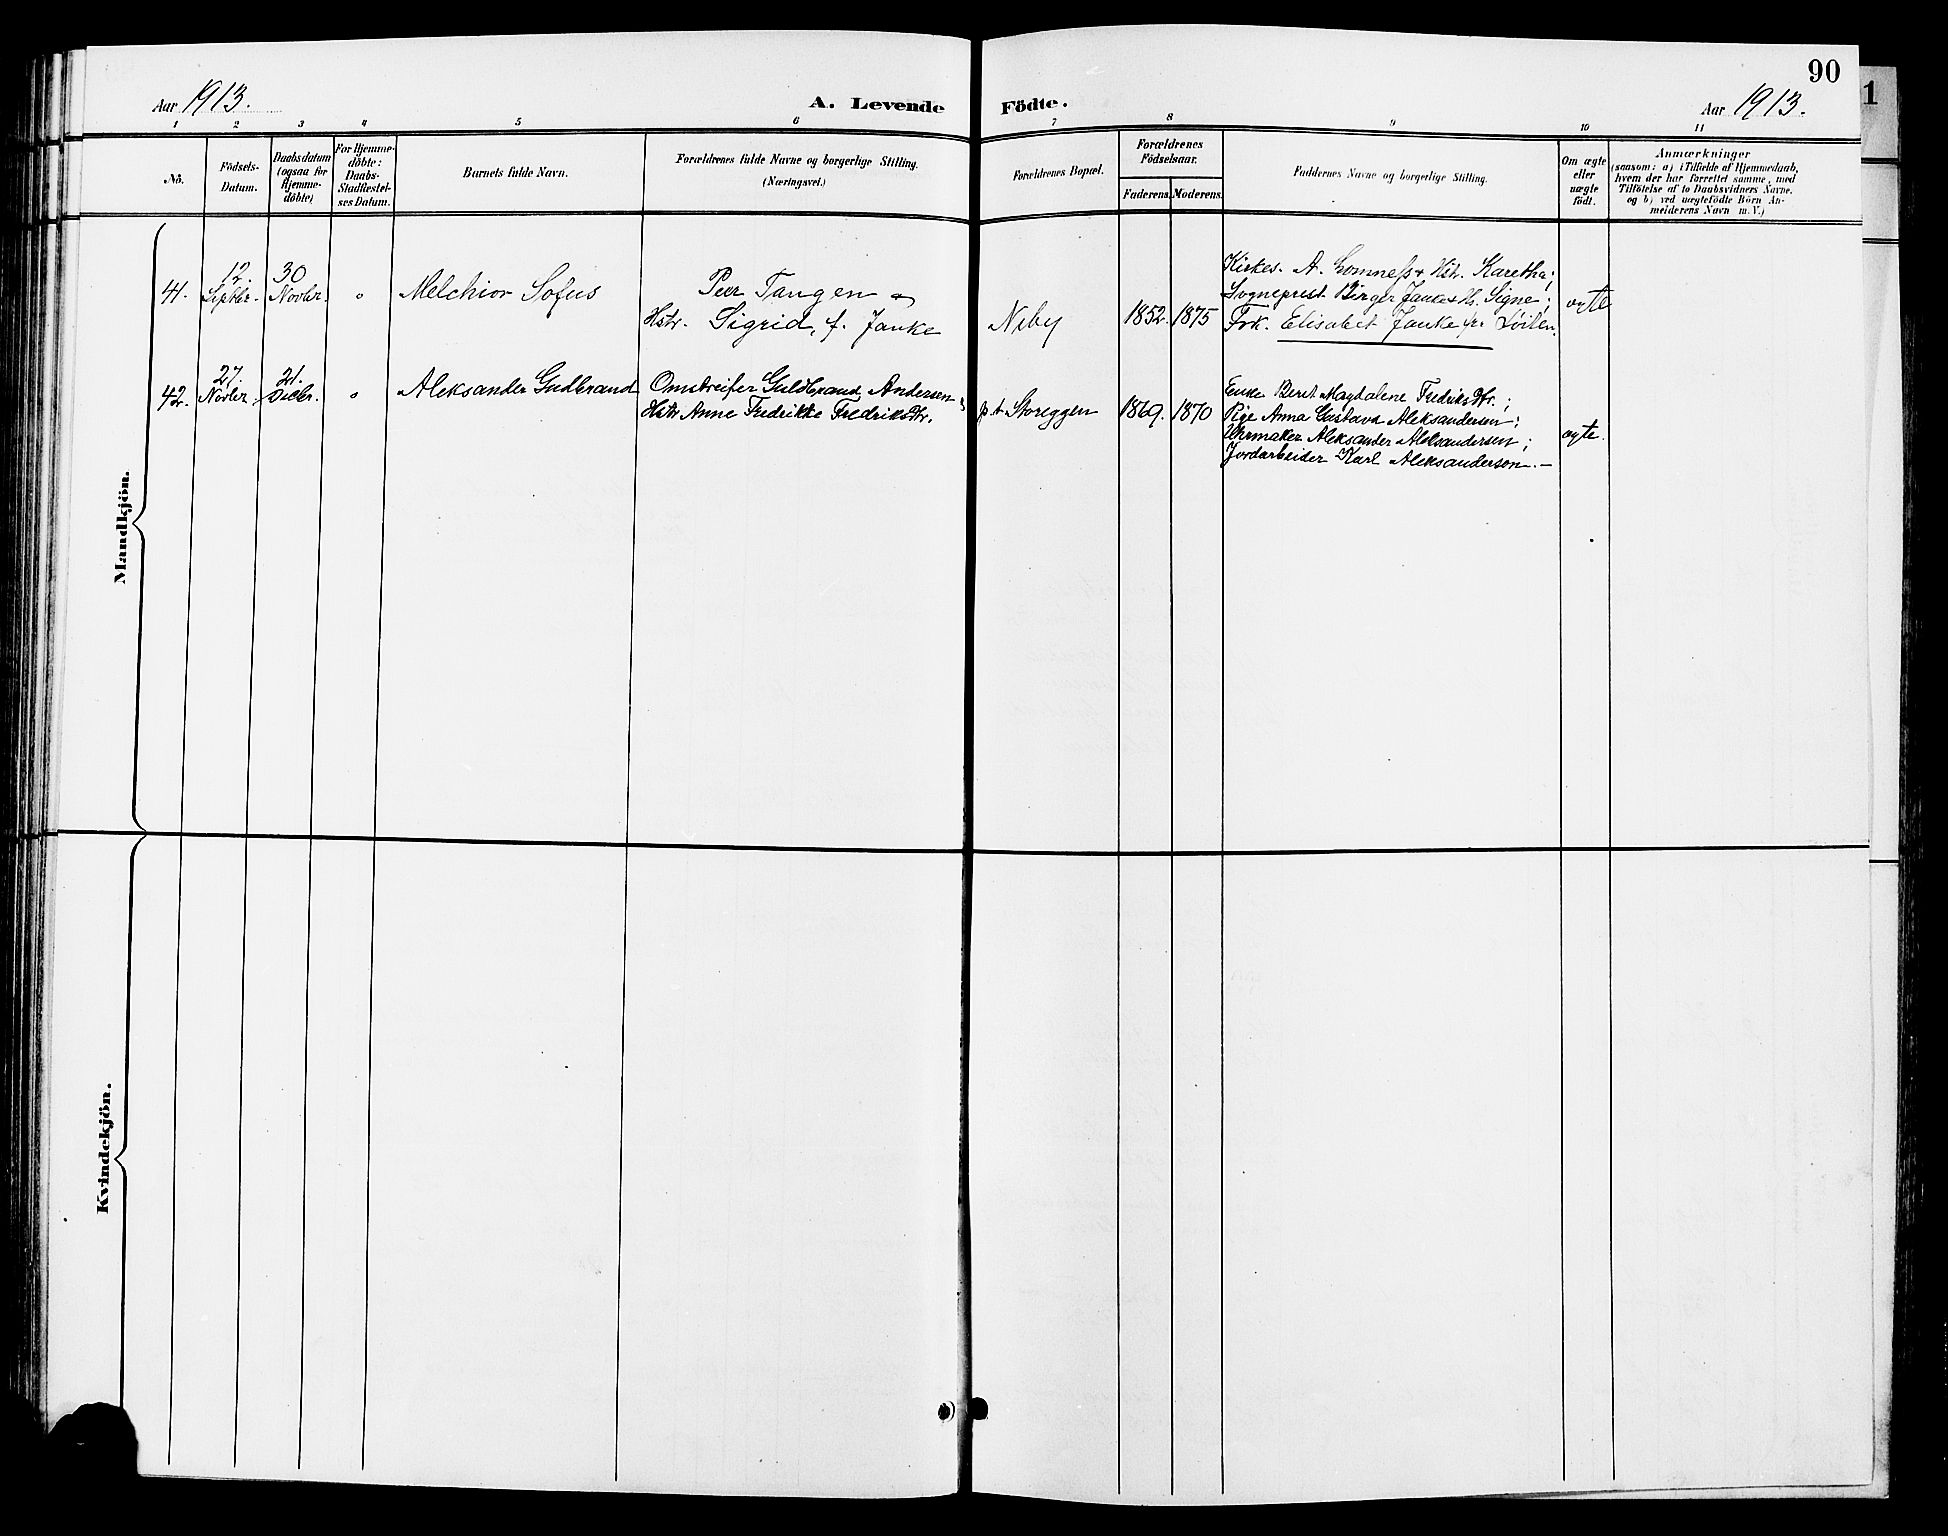 SAH, Tynset prestekontor, Klokkerbok nr. 9, 1900-1914, s. 90